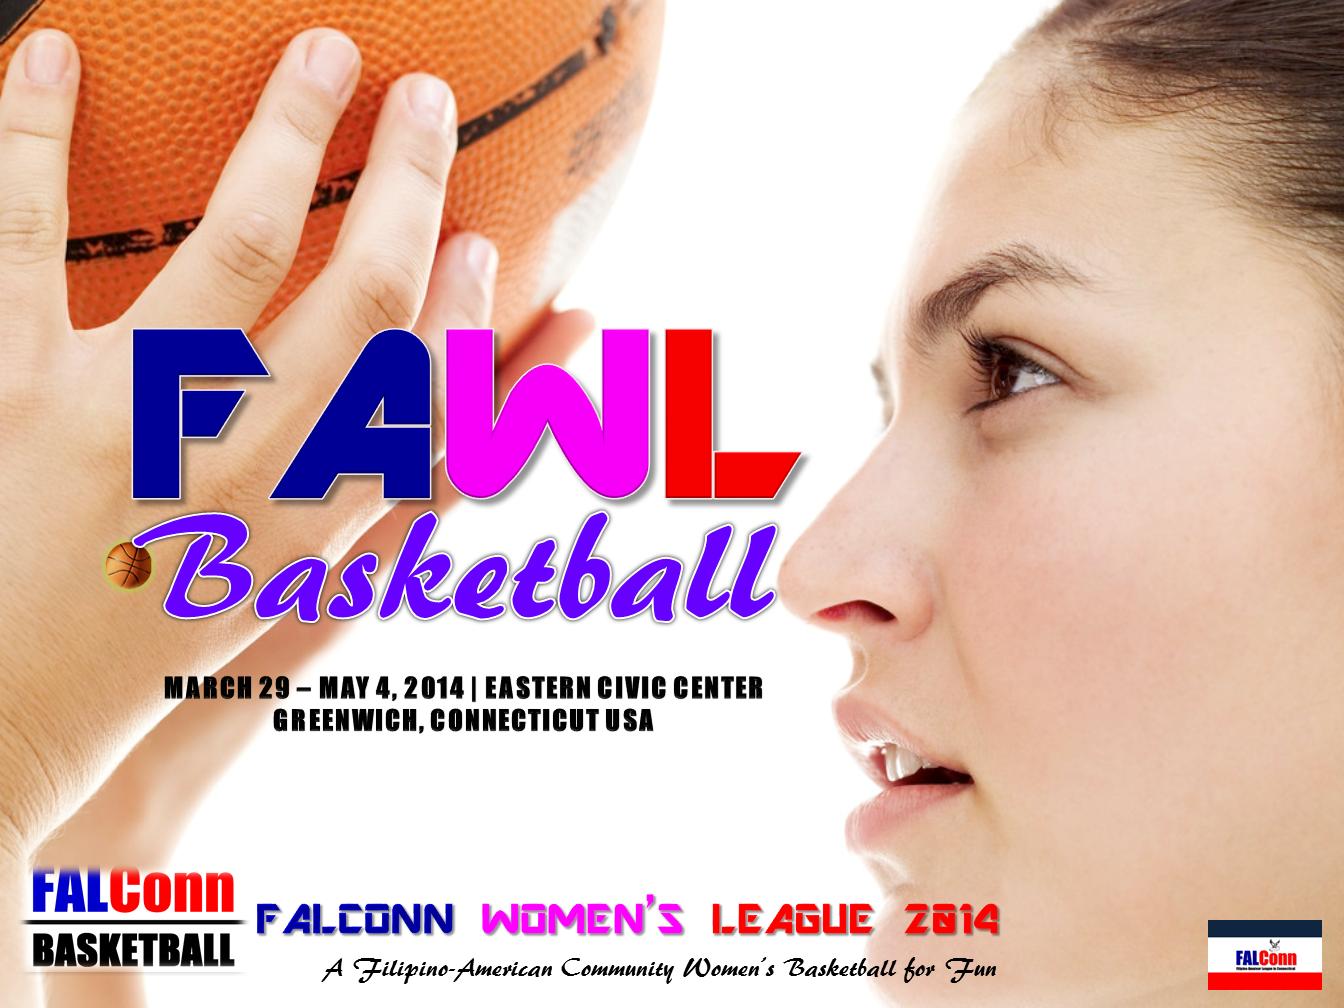 Women-poster3-fawl1.png